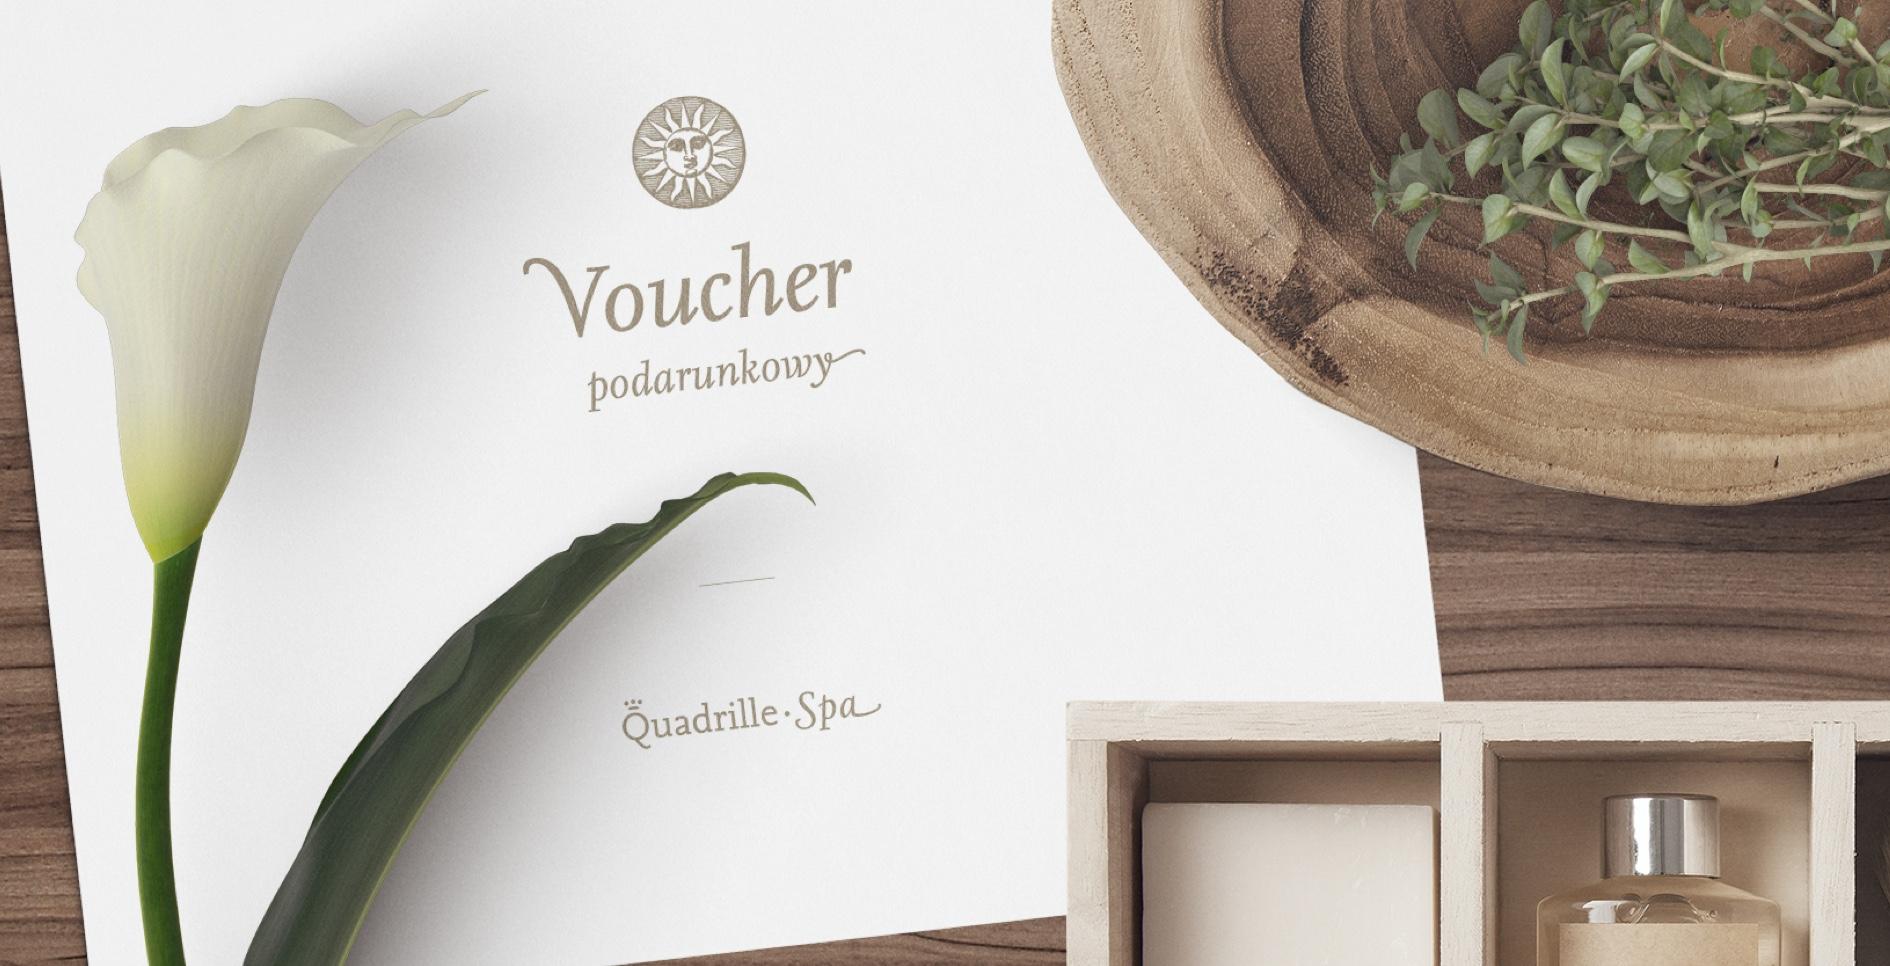 Voucher podarunkowy Quadrille Spa